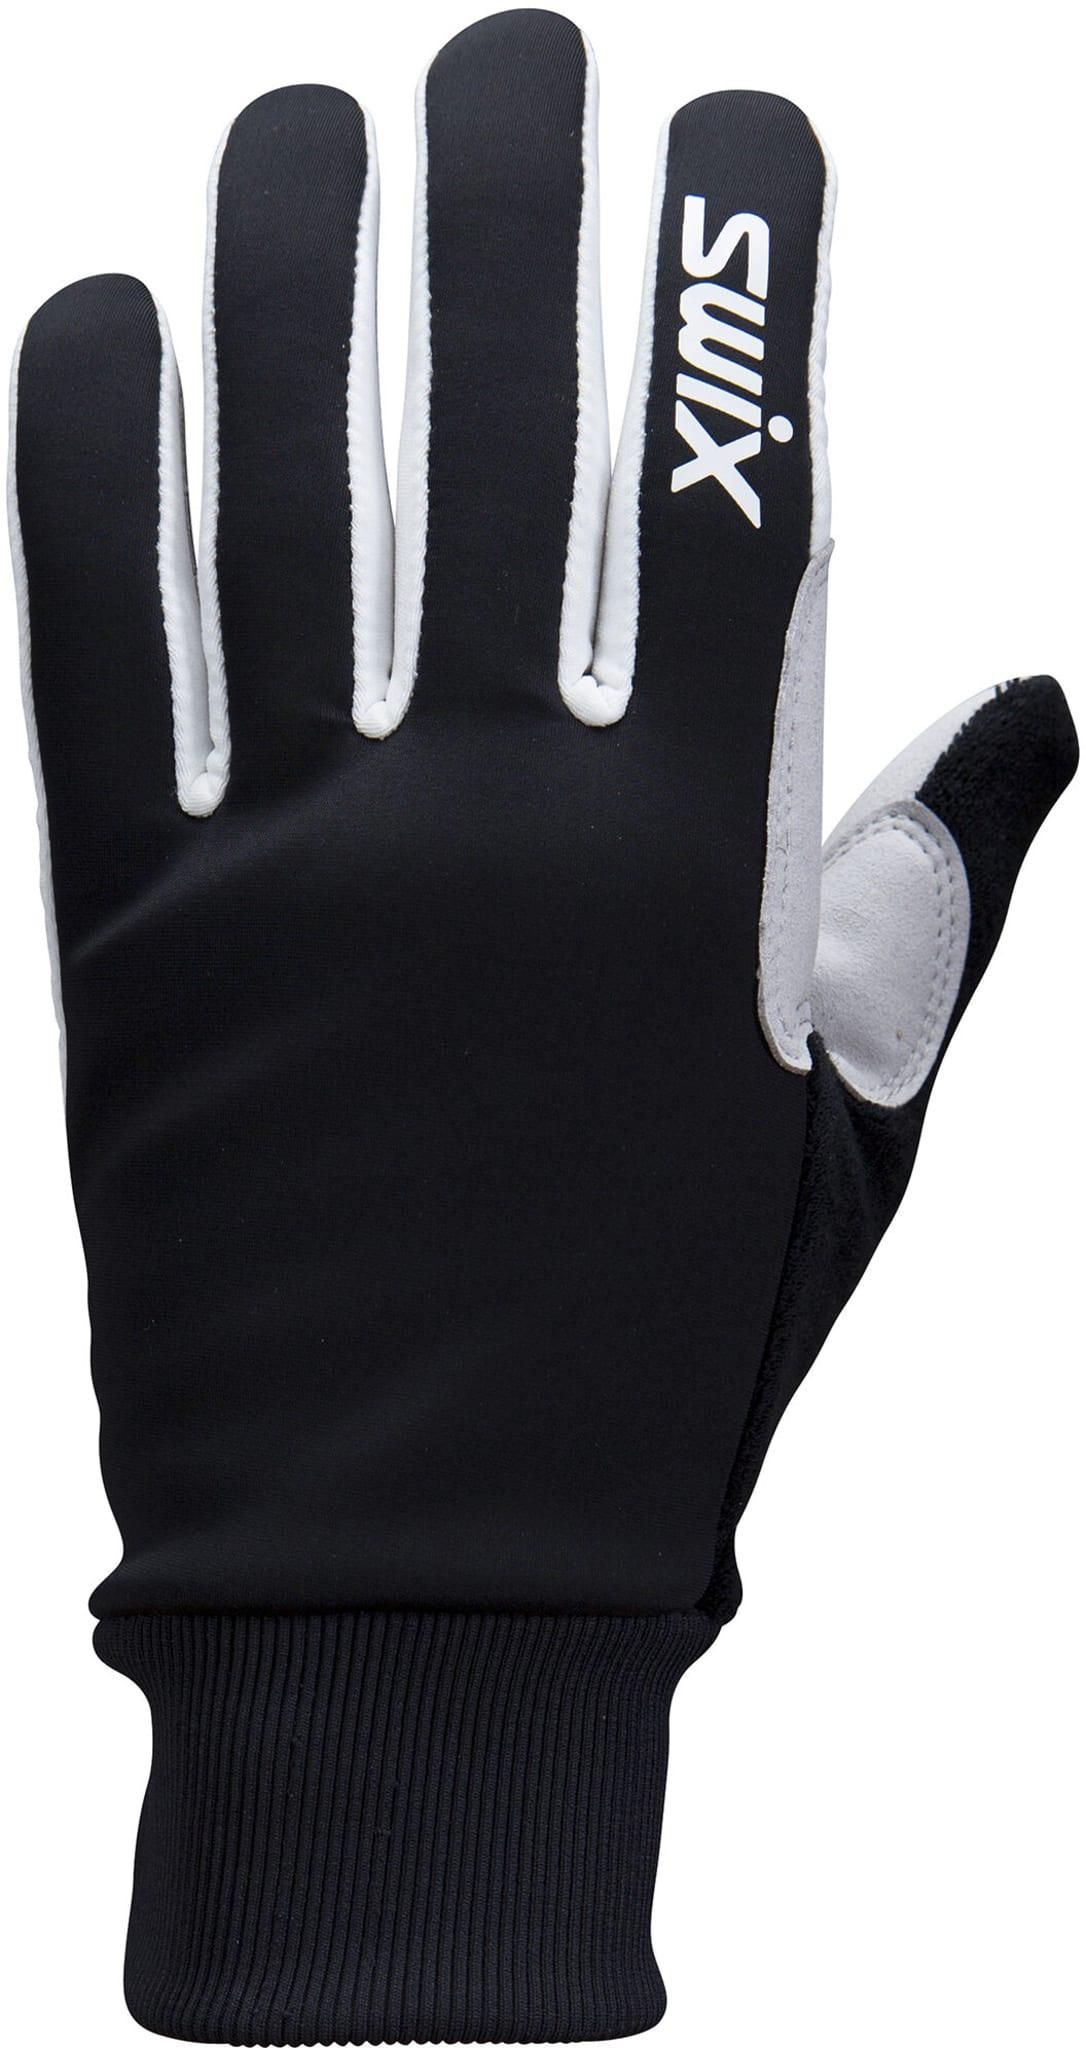 Steady Glove Jr.